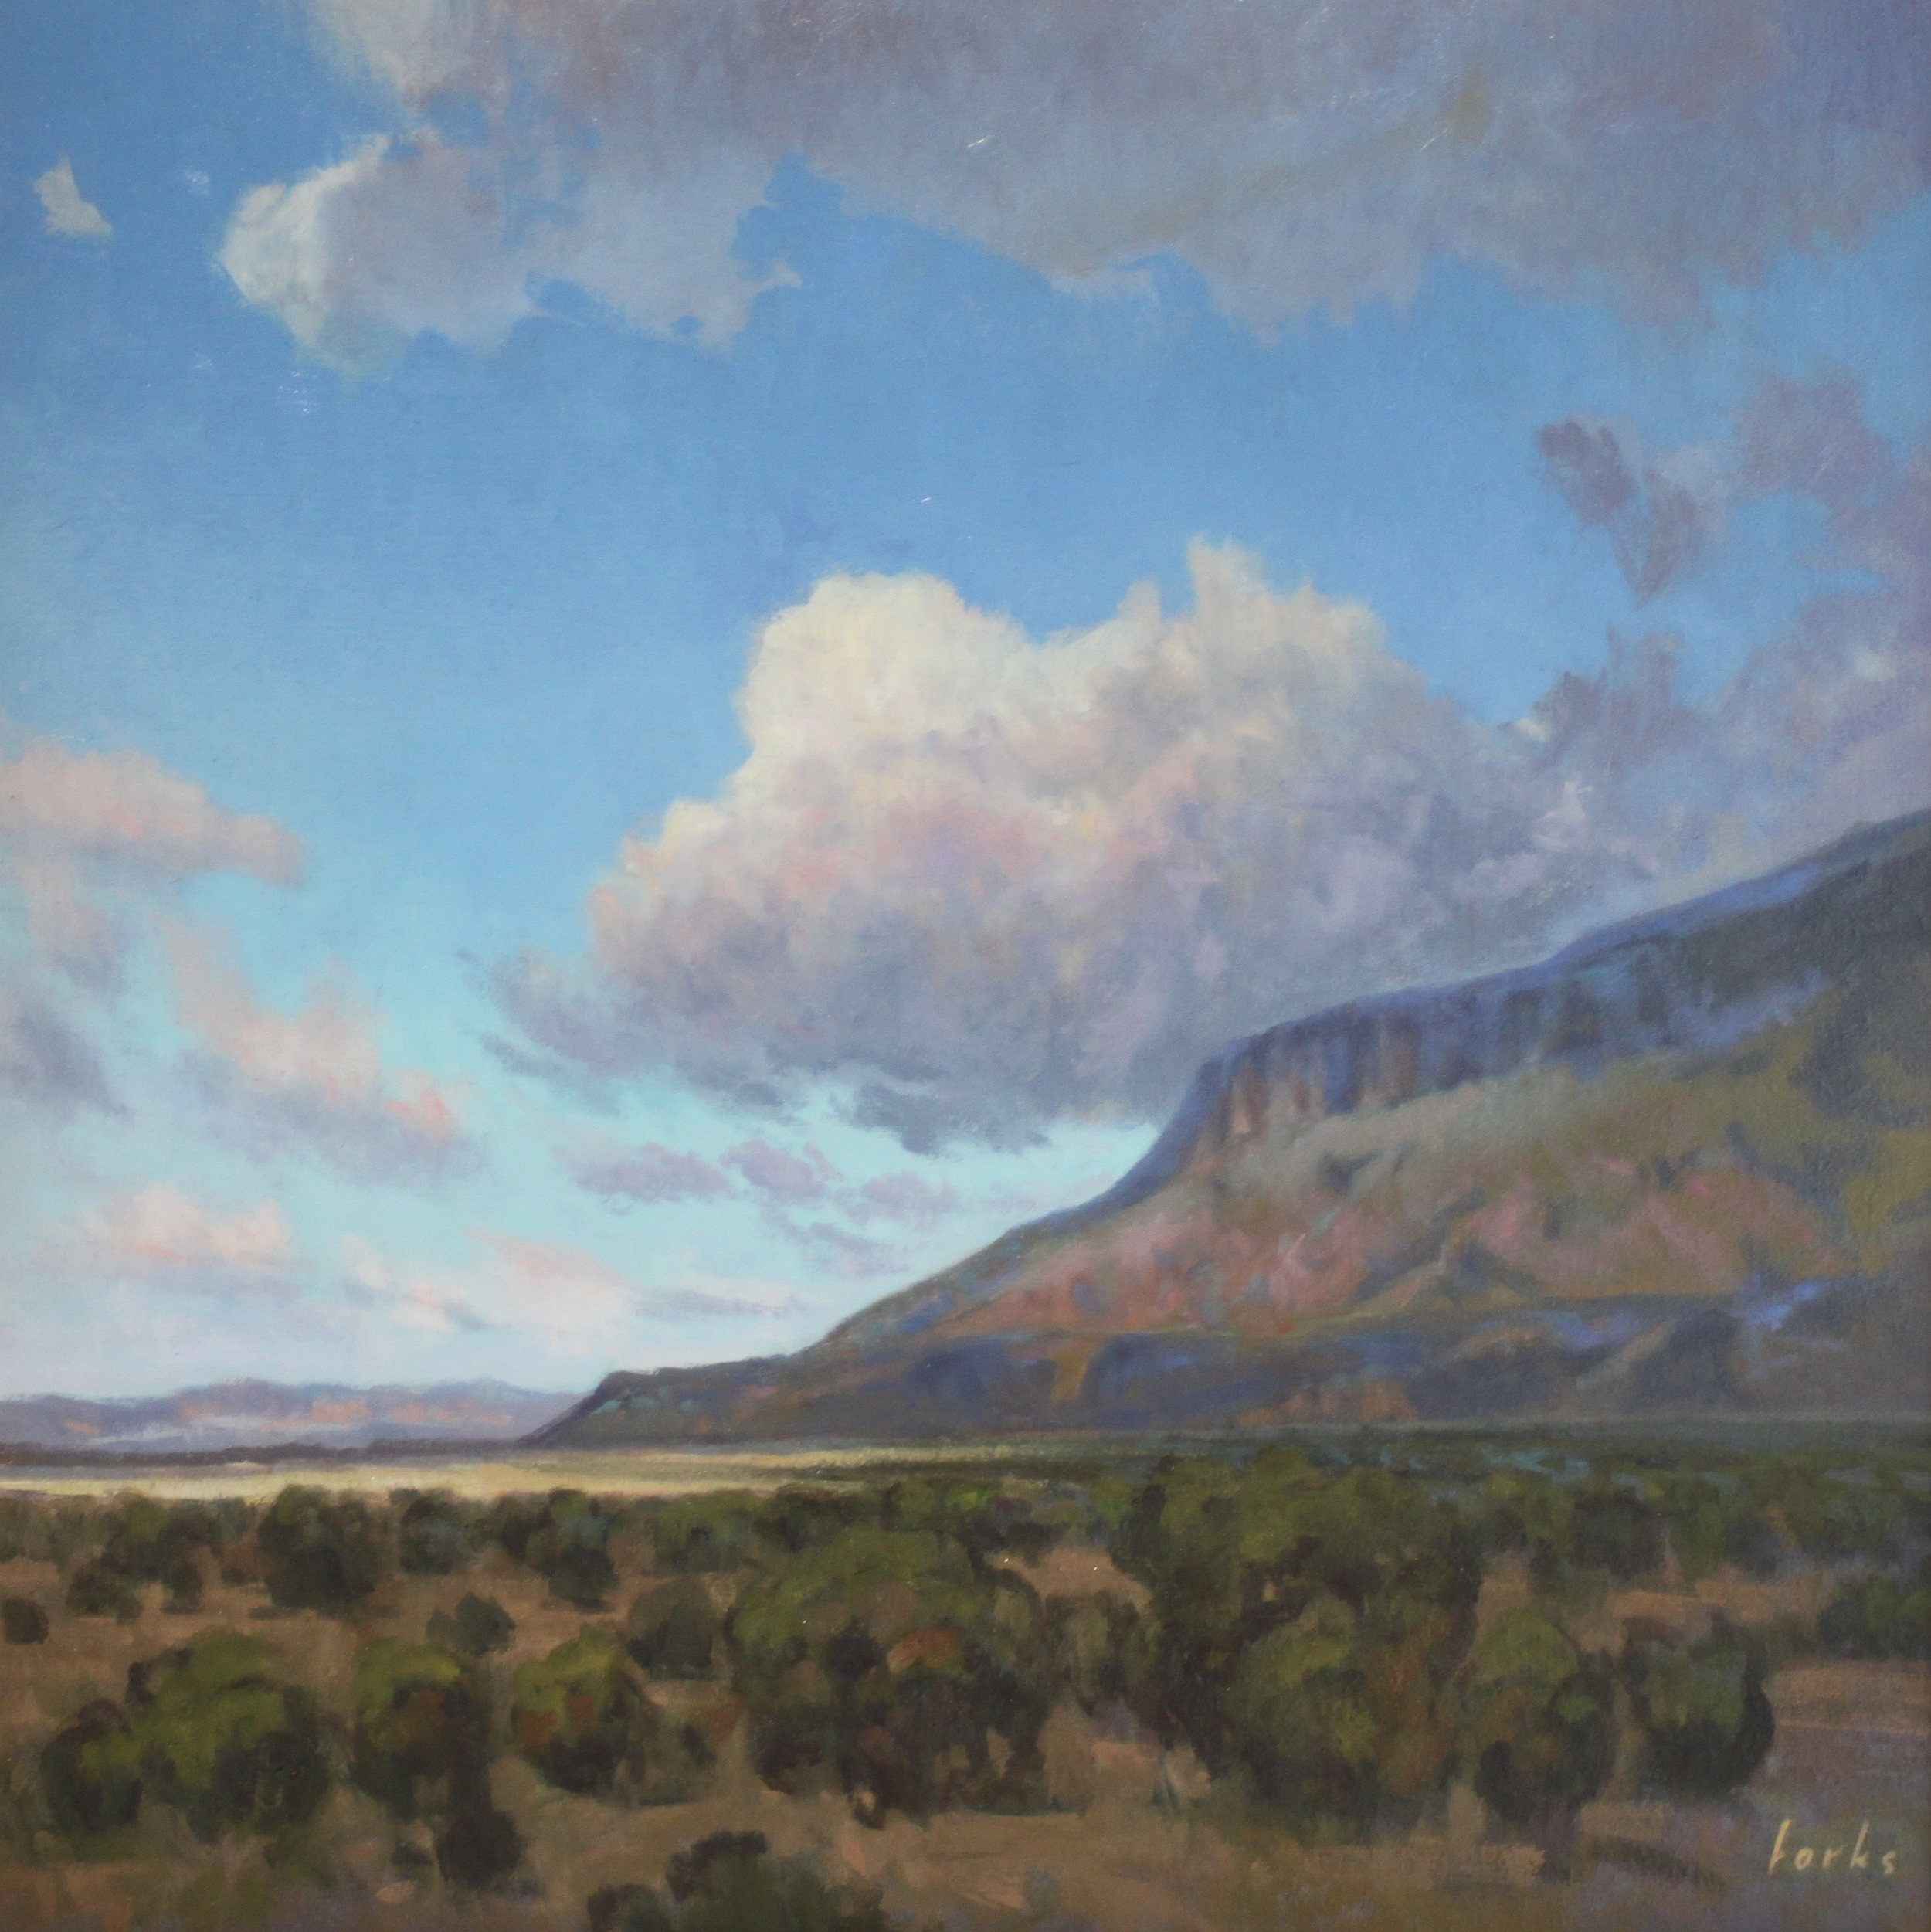 David Forks A Fair Warning 24X24 Oil on Canvas $1,728.jpg